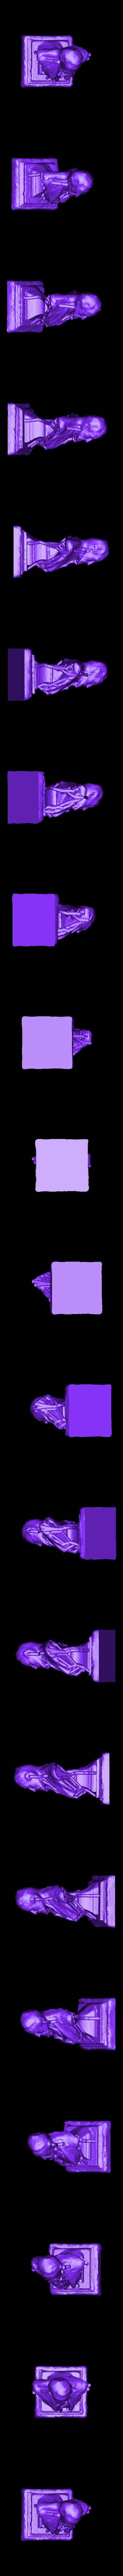 GE_Finch_-_Oakham_Castle_with_supports.stl Download free OBJ file G.H. Finch MP (Oakham Castle) • 3D printer design, tone001